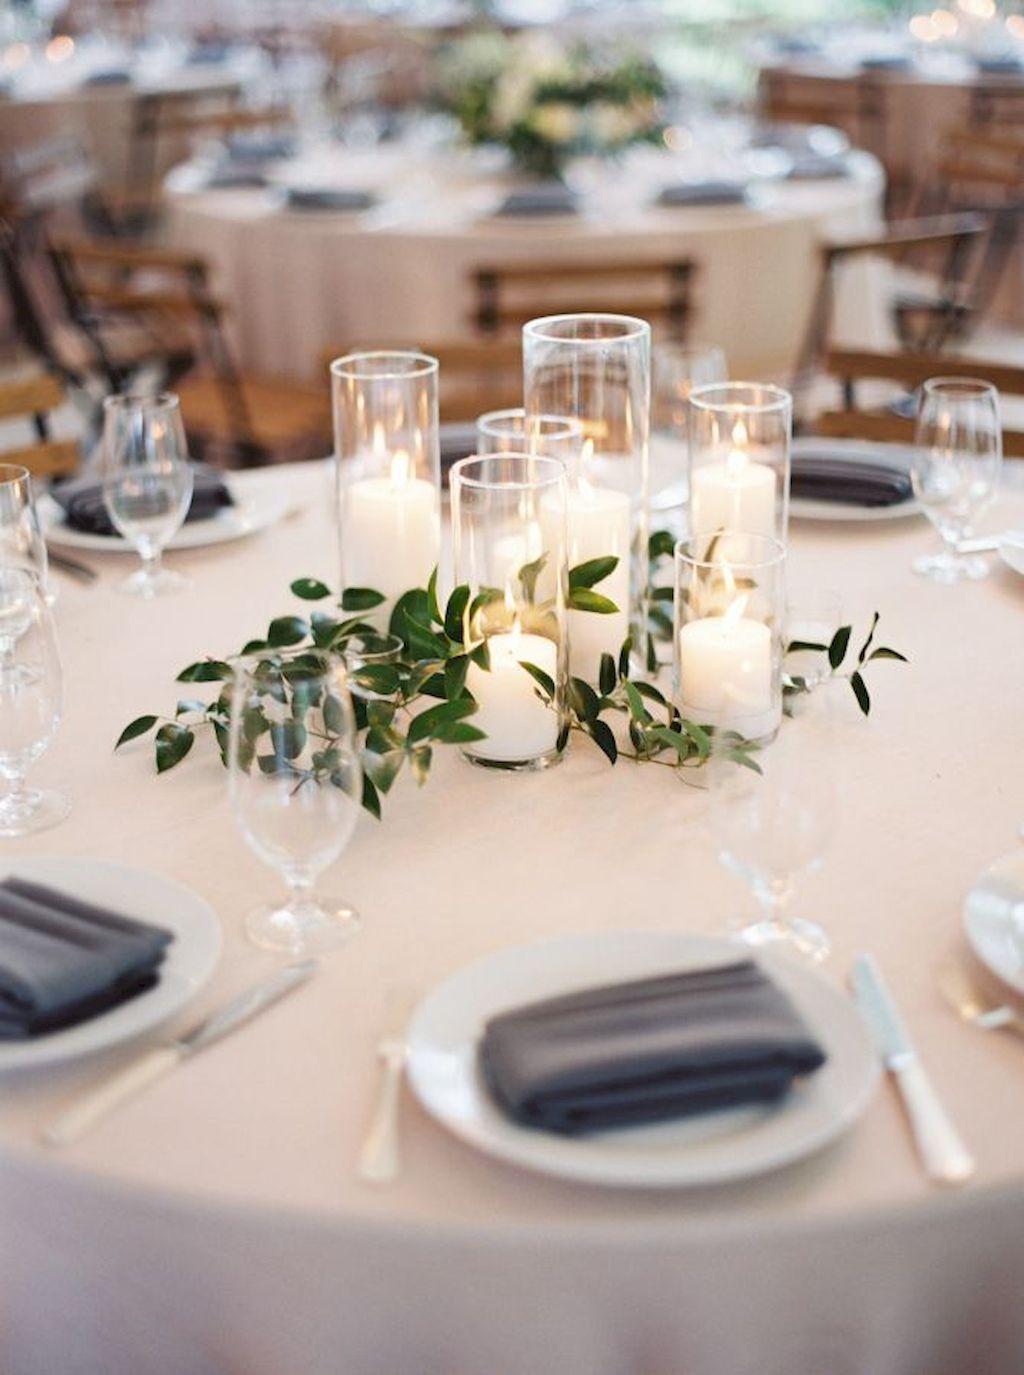 87 Simple And Easy Wedding Centerpiece Ideas Wedding Table